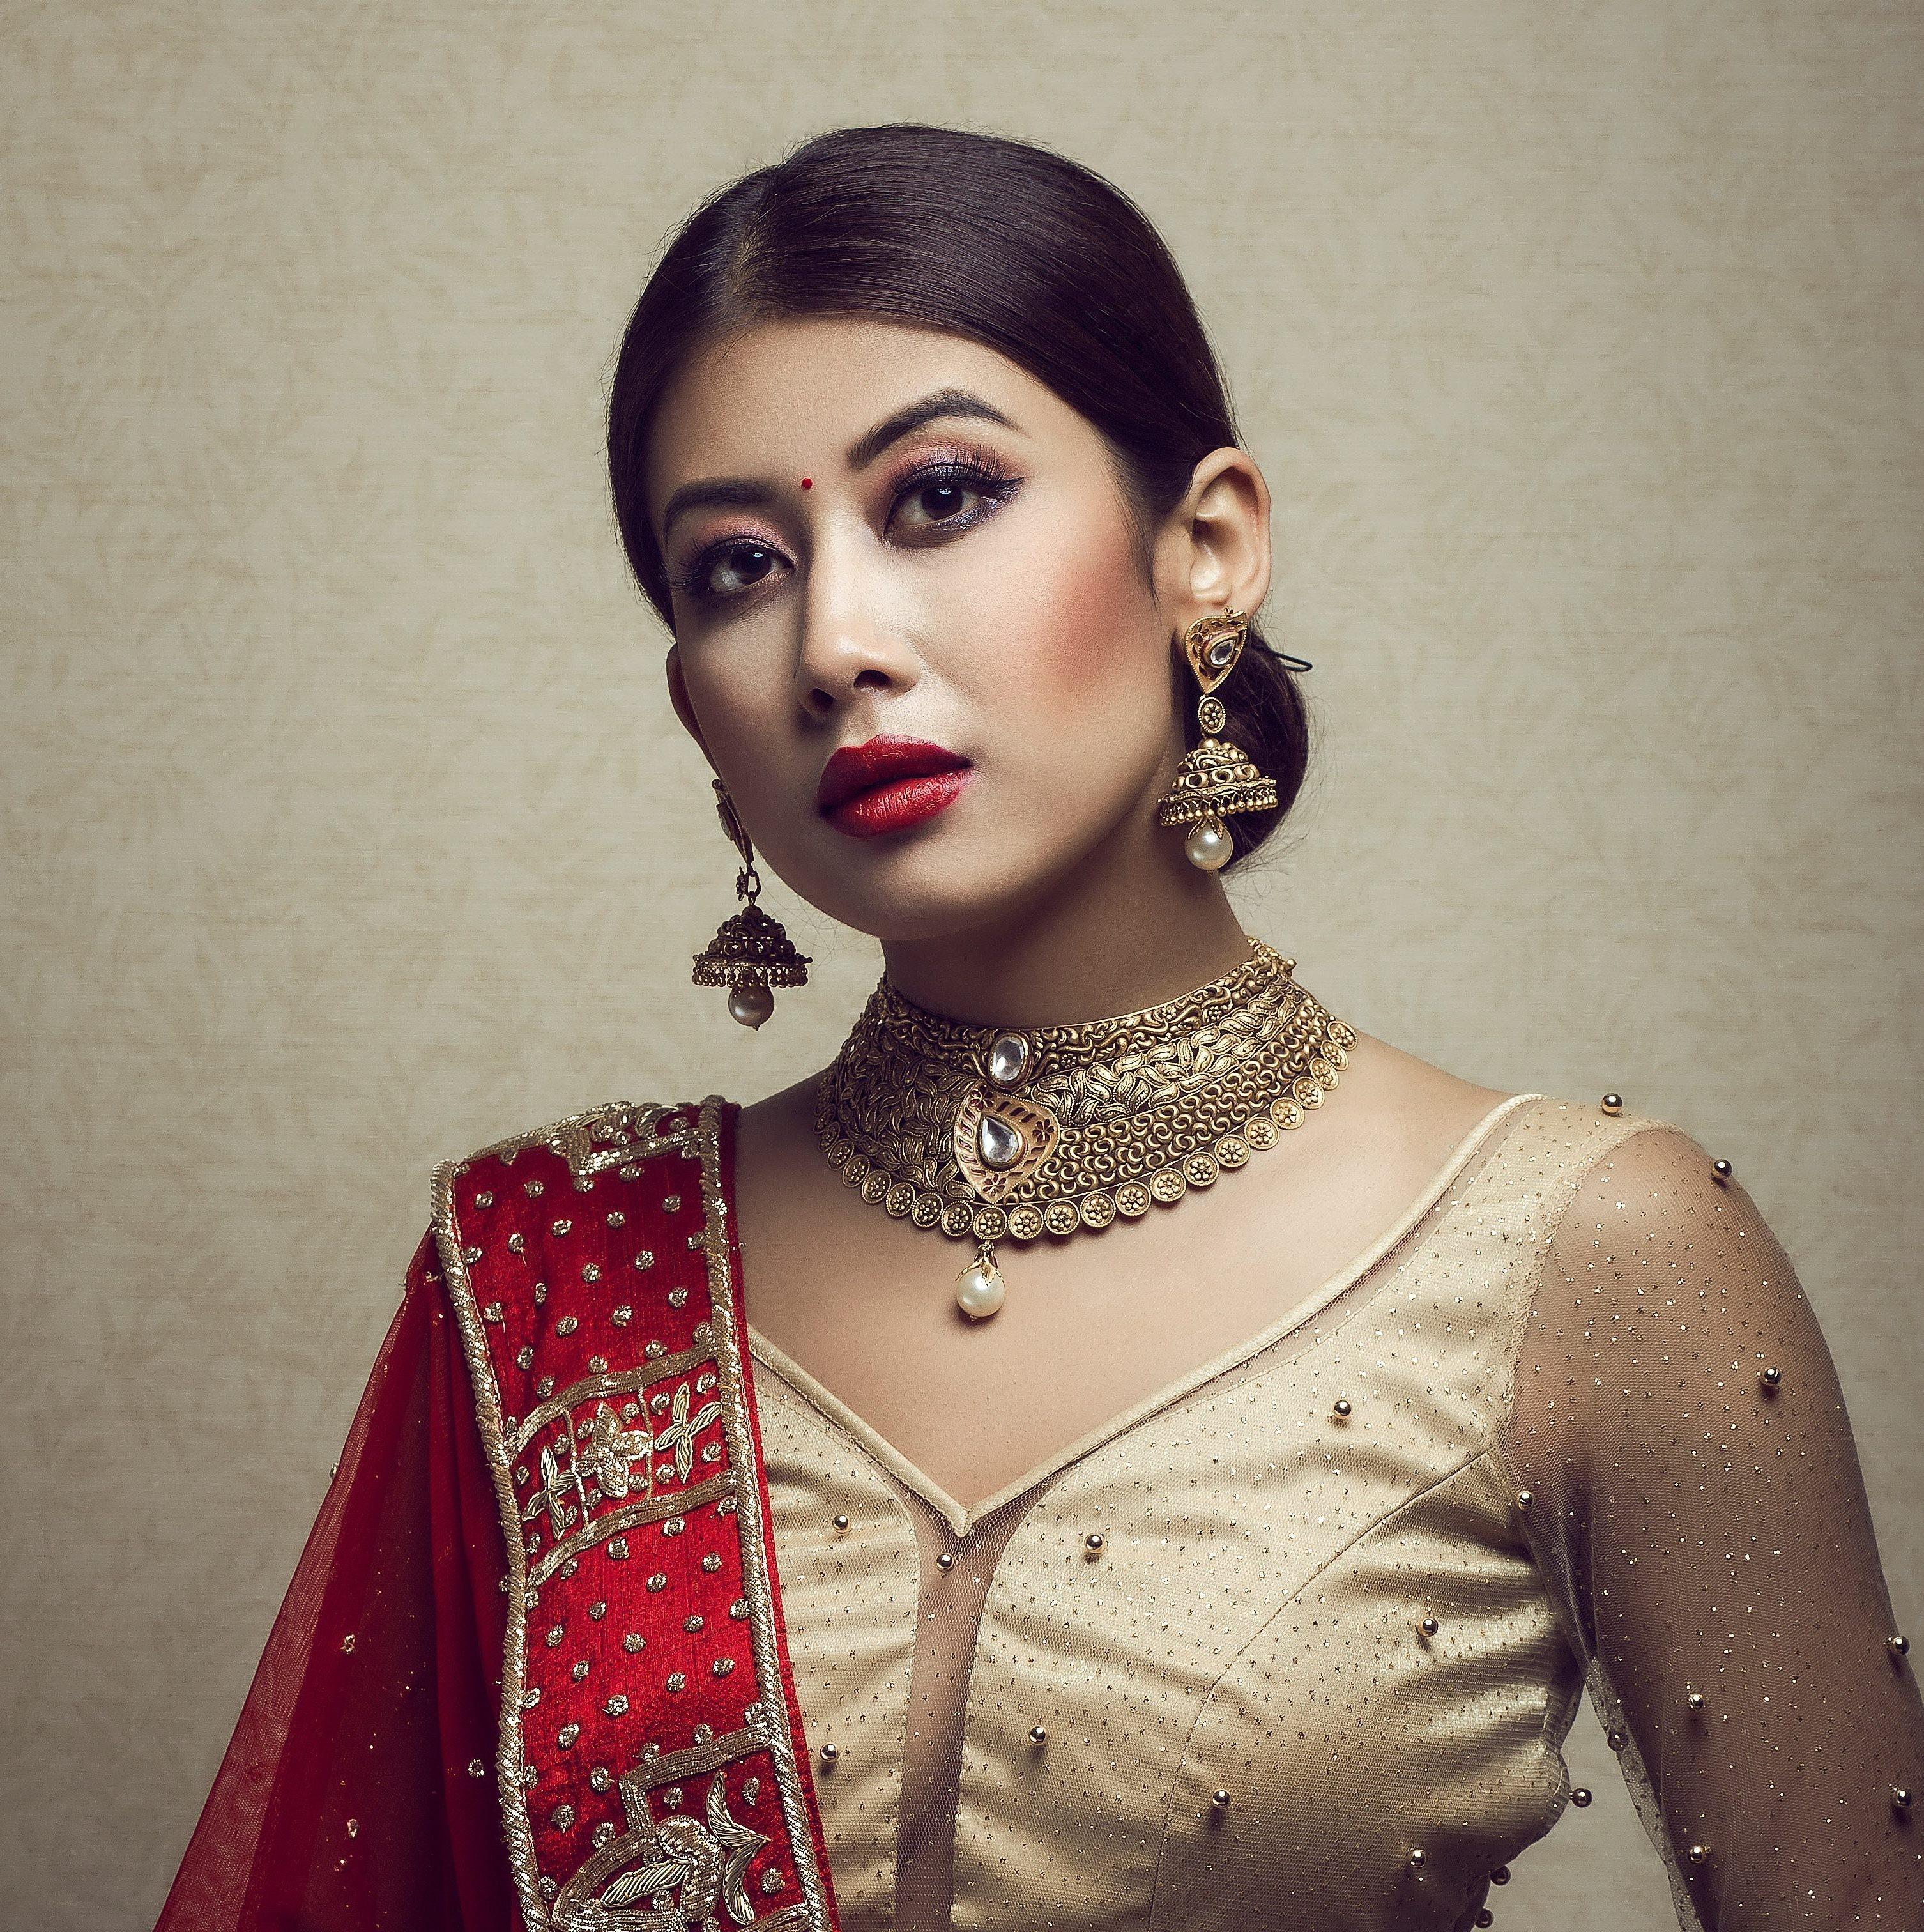 Asmi Shrestha